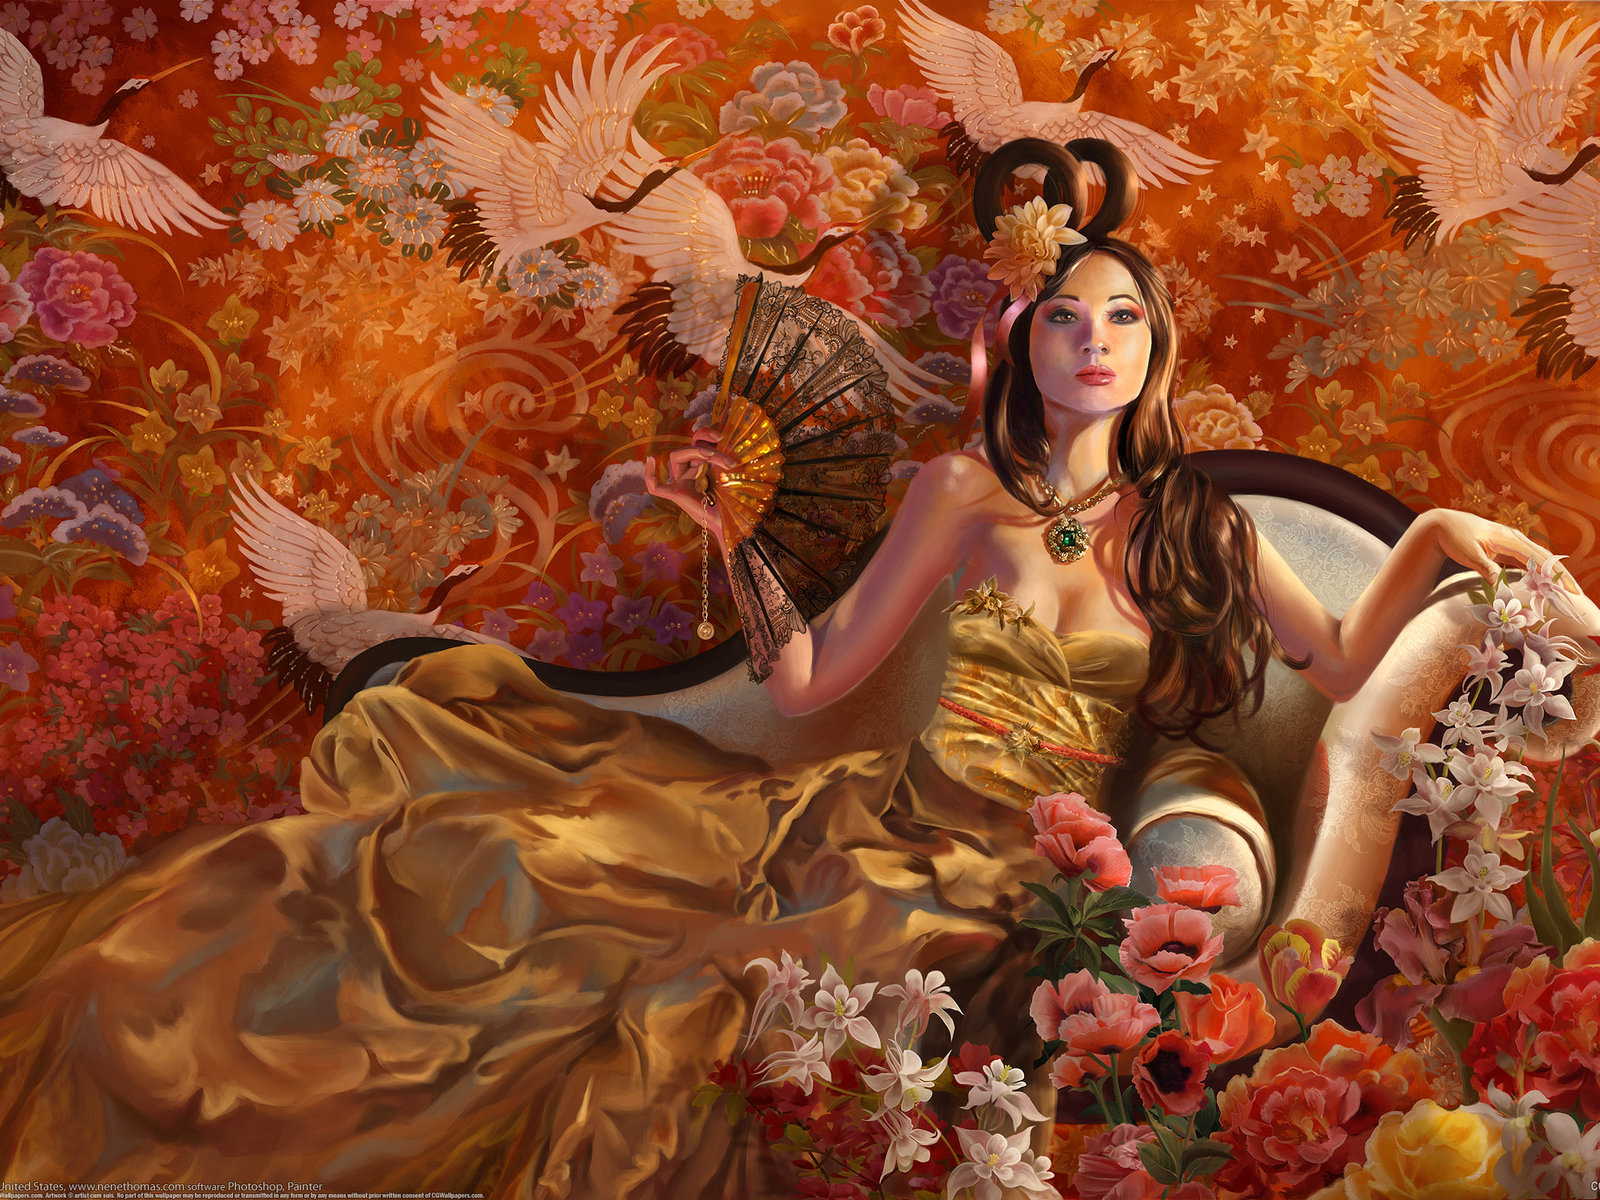 http://1.bp.blogspot.com/-bzkiNae-jU4/T8tCtAbXWoI/AAAAAAAAEzU/nafaR3_Iigg/s1600/CG_Women_wallpapers.jpg